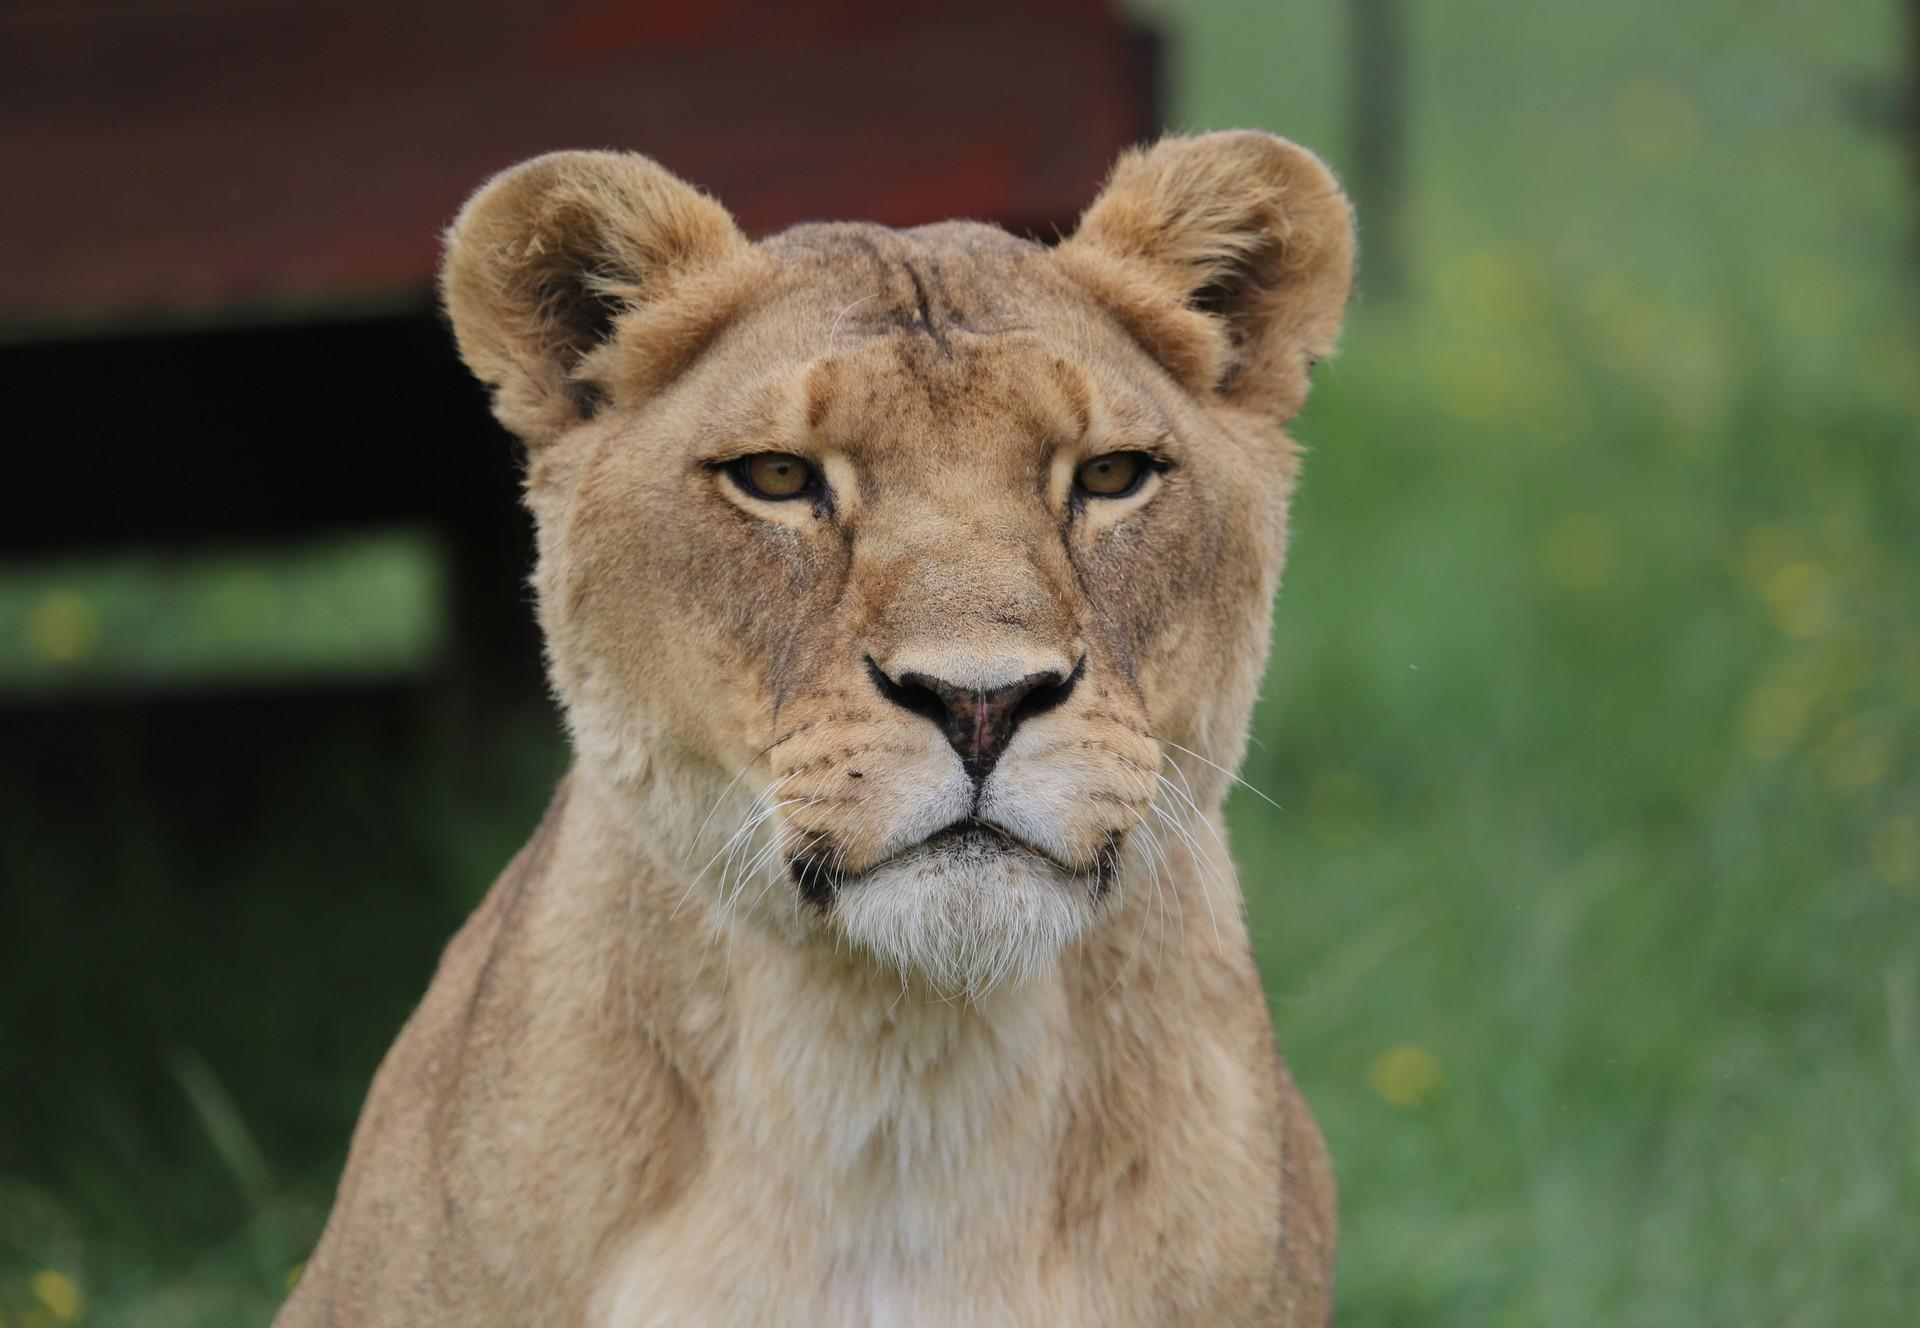 Lioness Neida at LIONSROCK